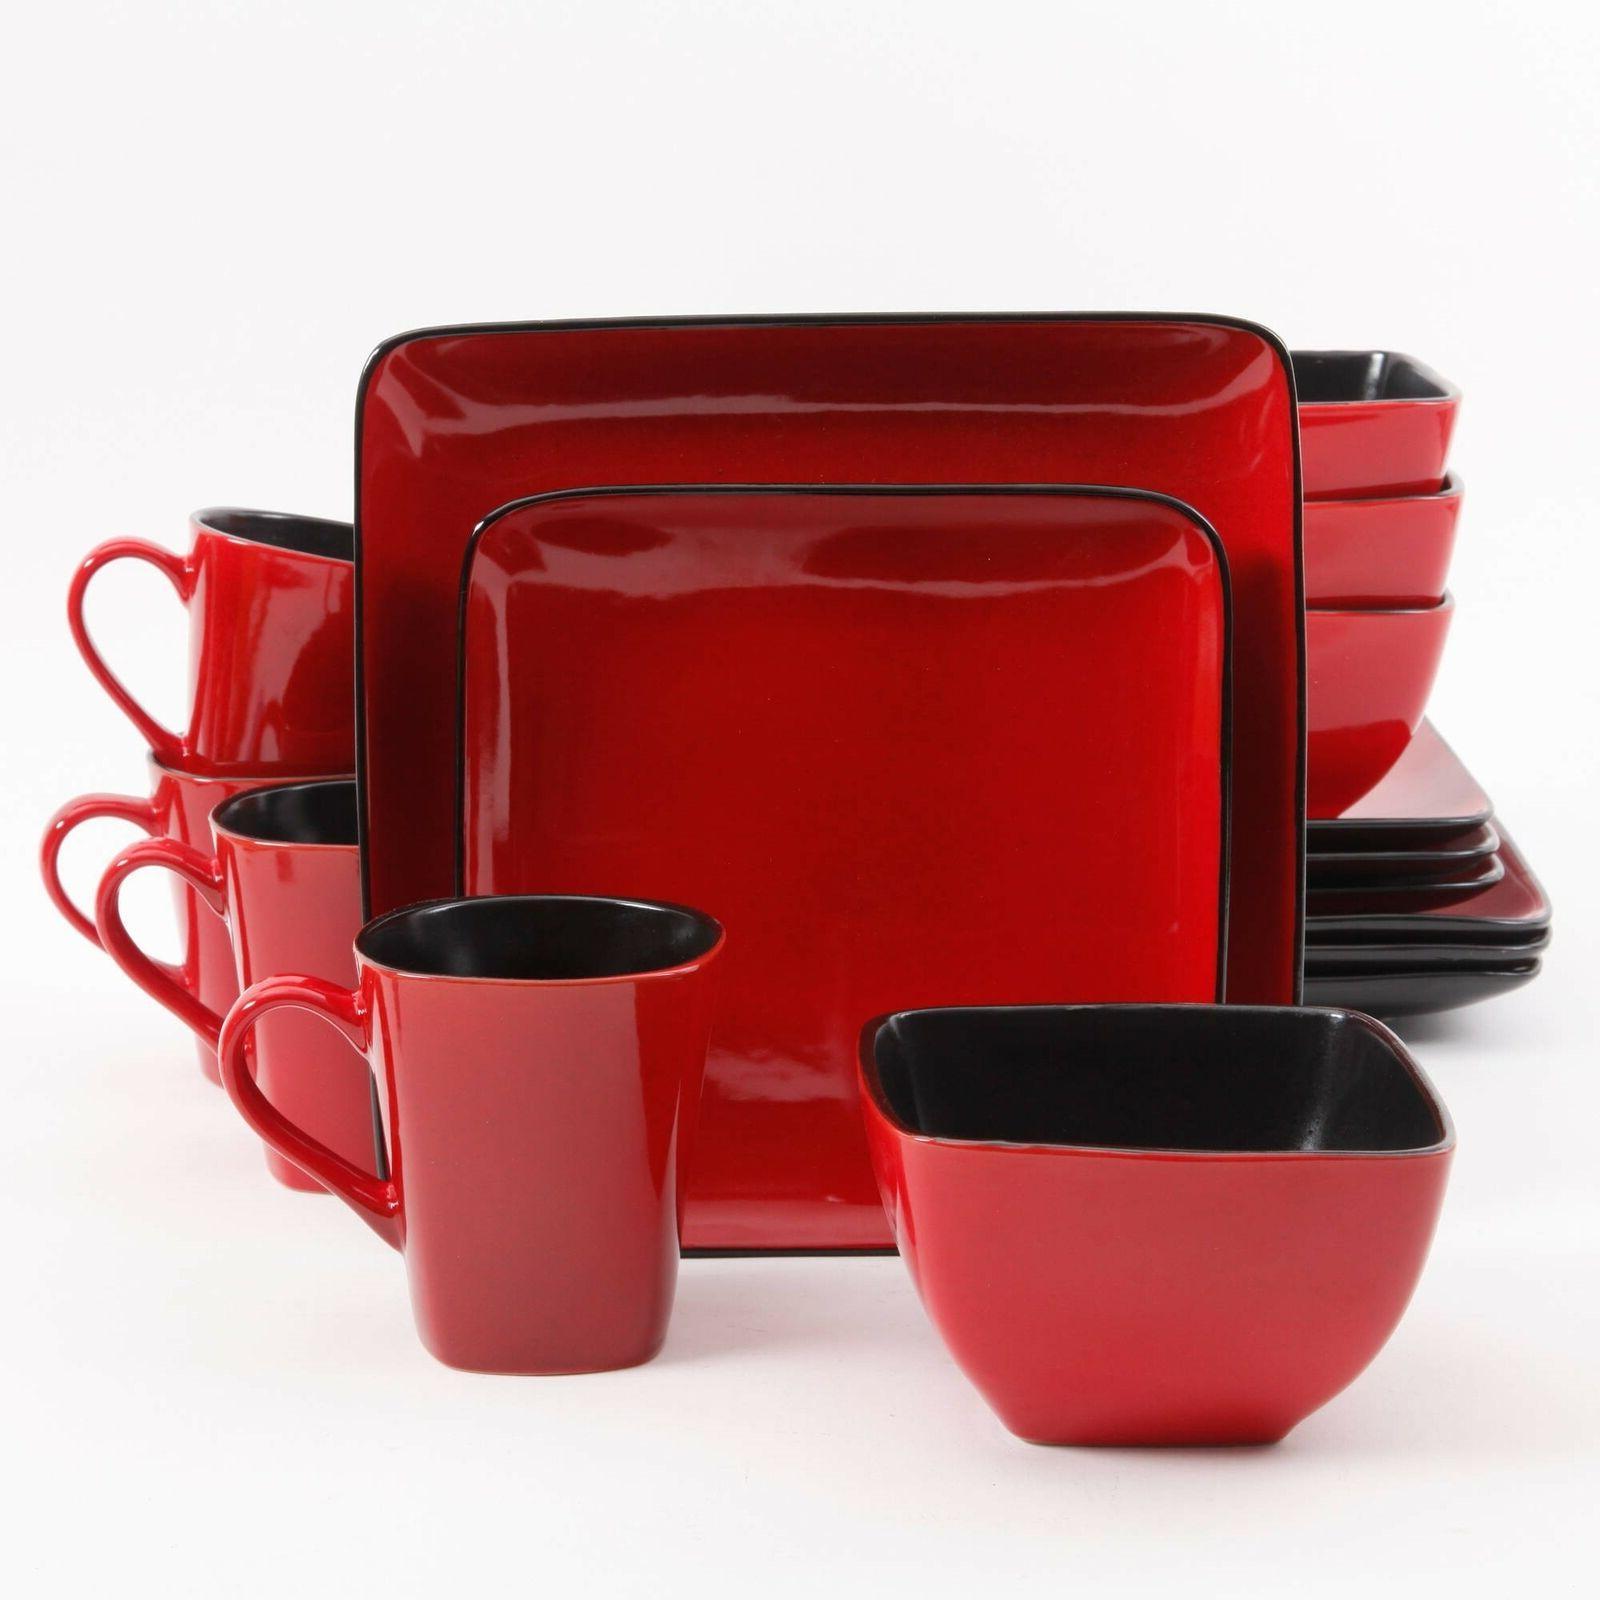 dinnerware set serving dishes plate mug bowl